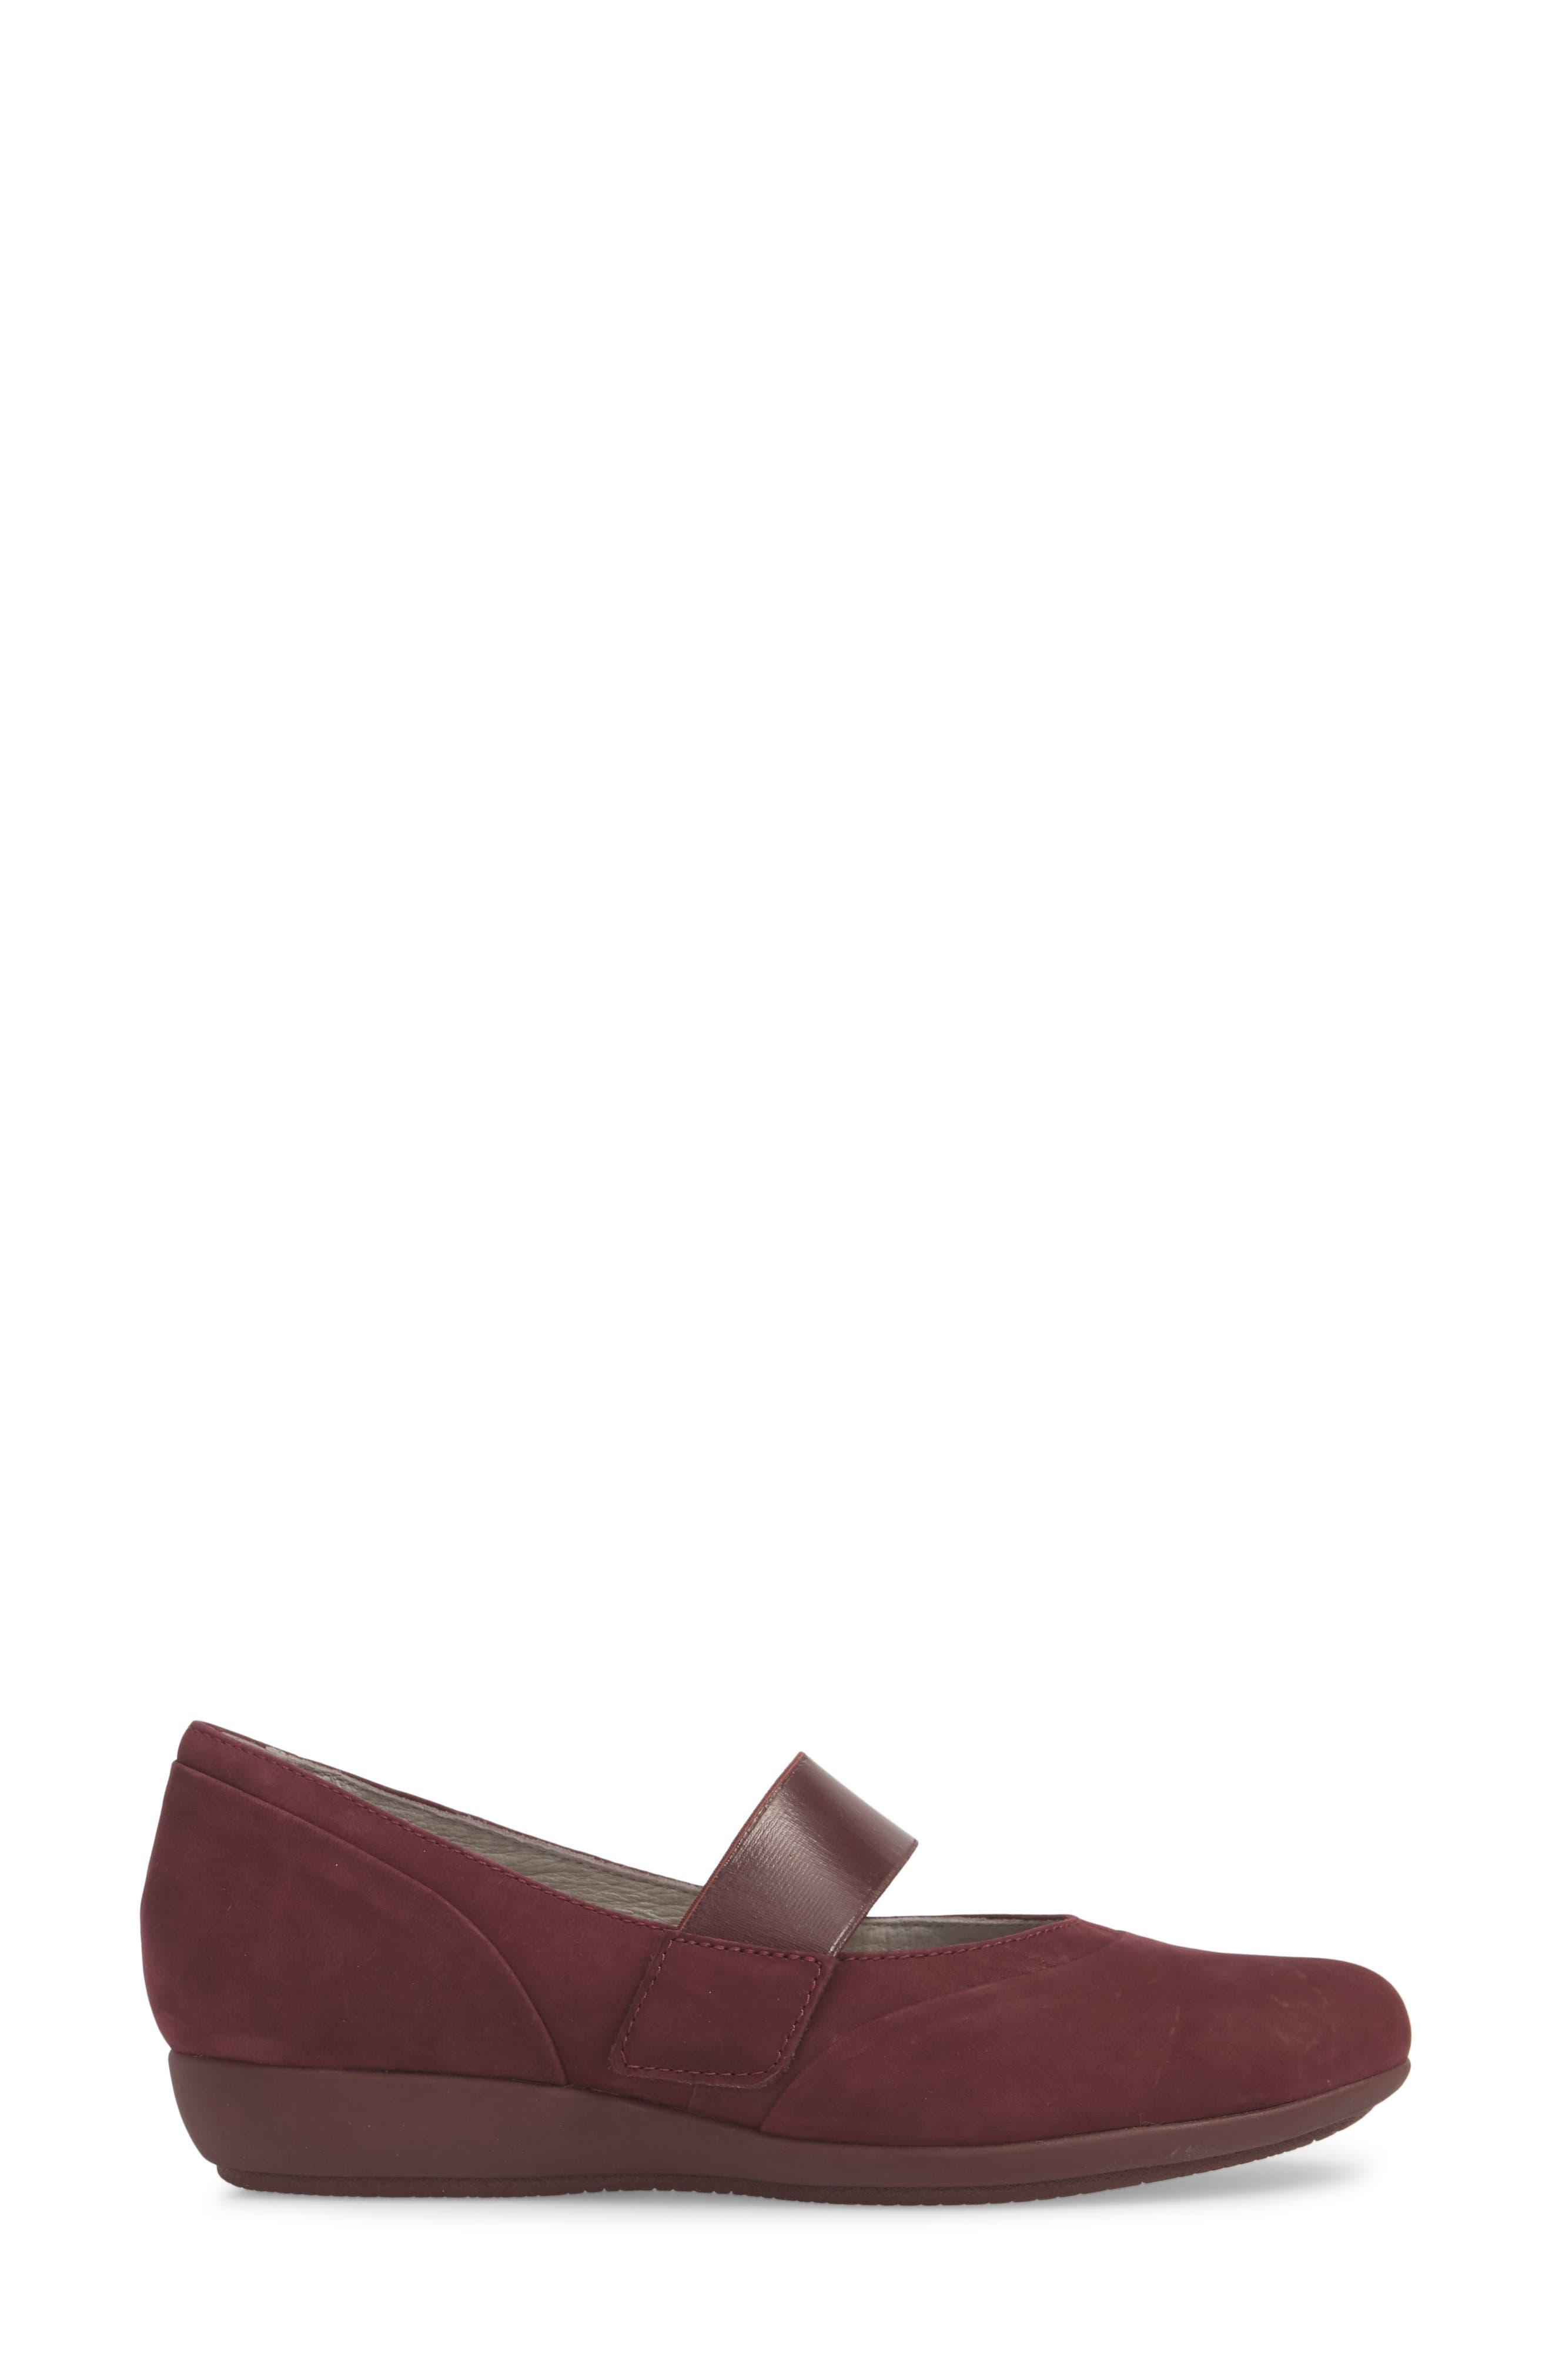 Kendra Mary Jane Wedge,                             Alternate thumbnail 6, color,                             Wine Milled Nubuck Leather